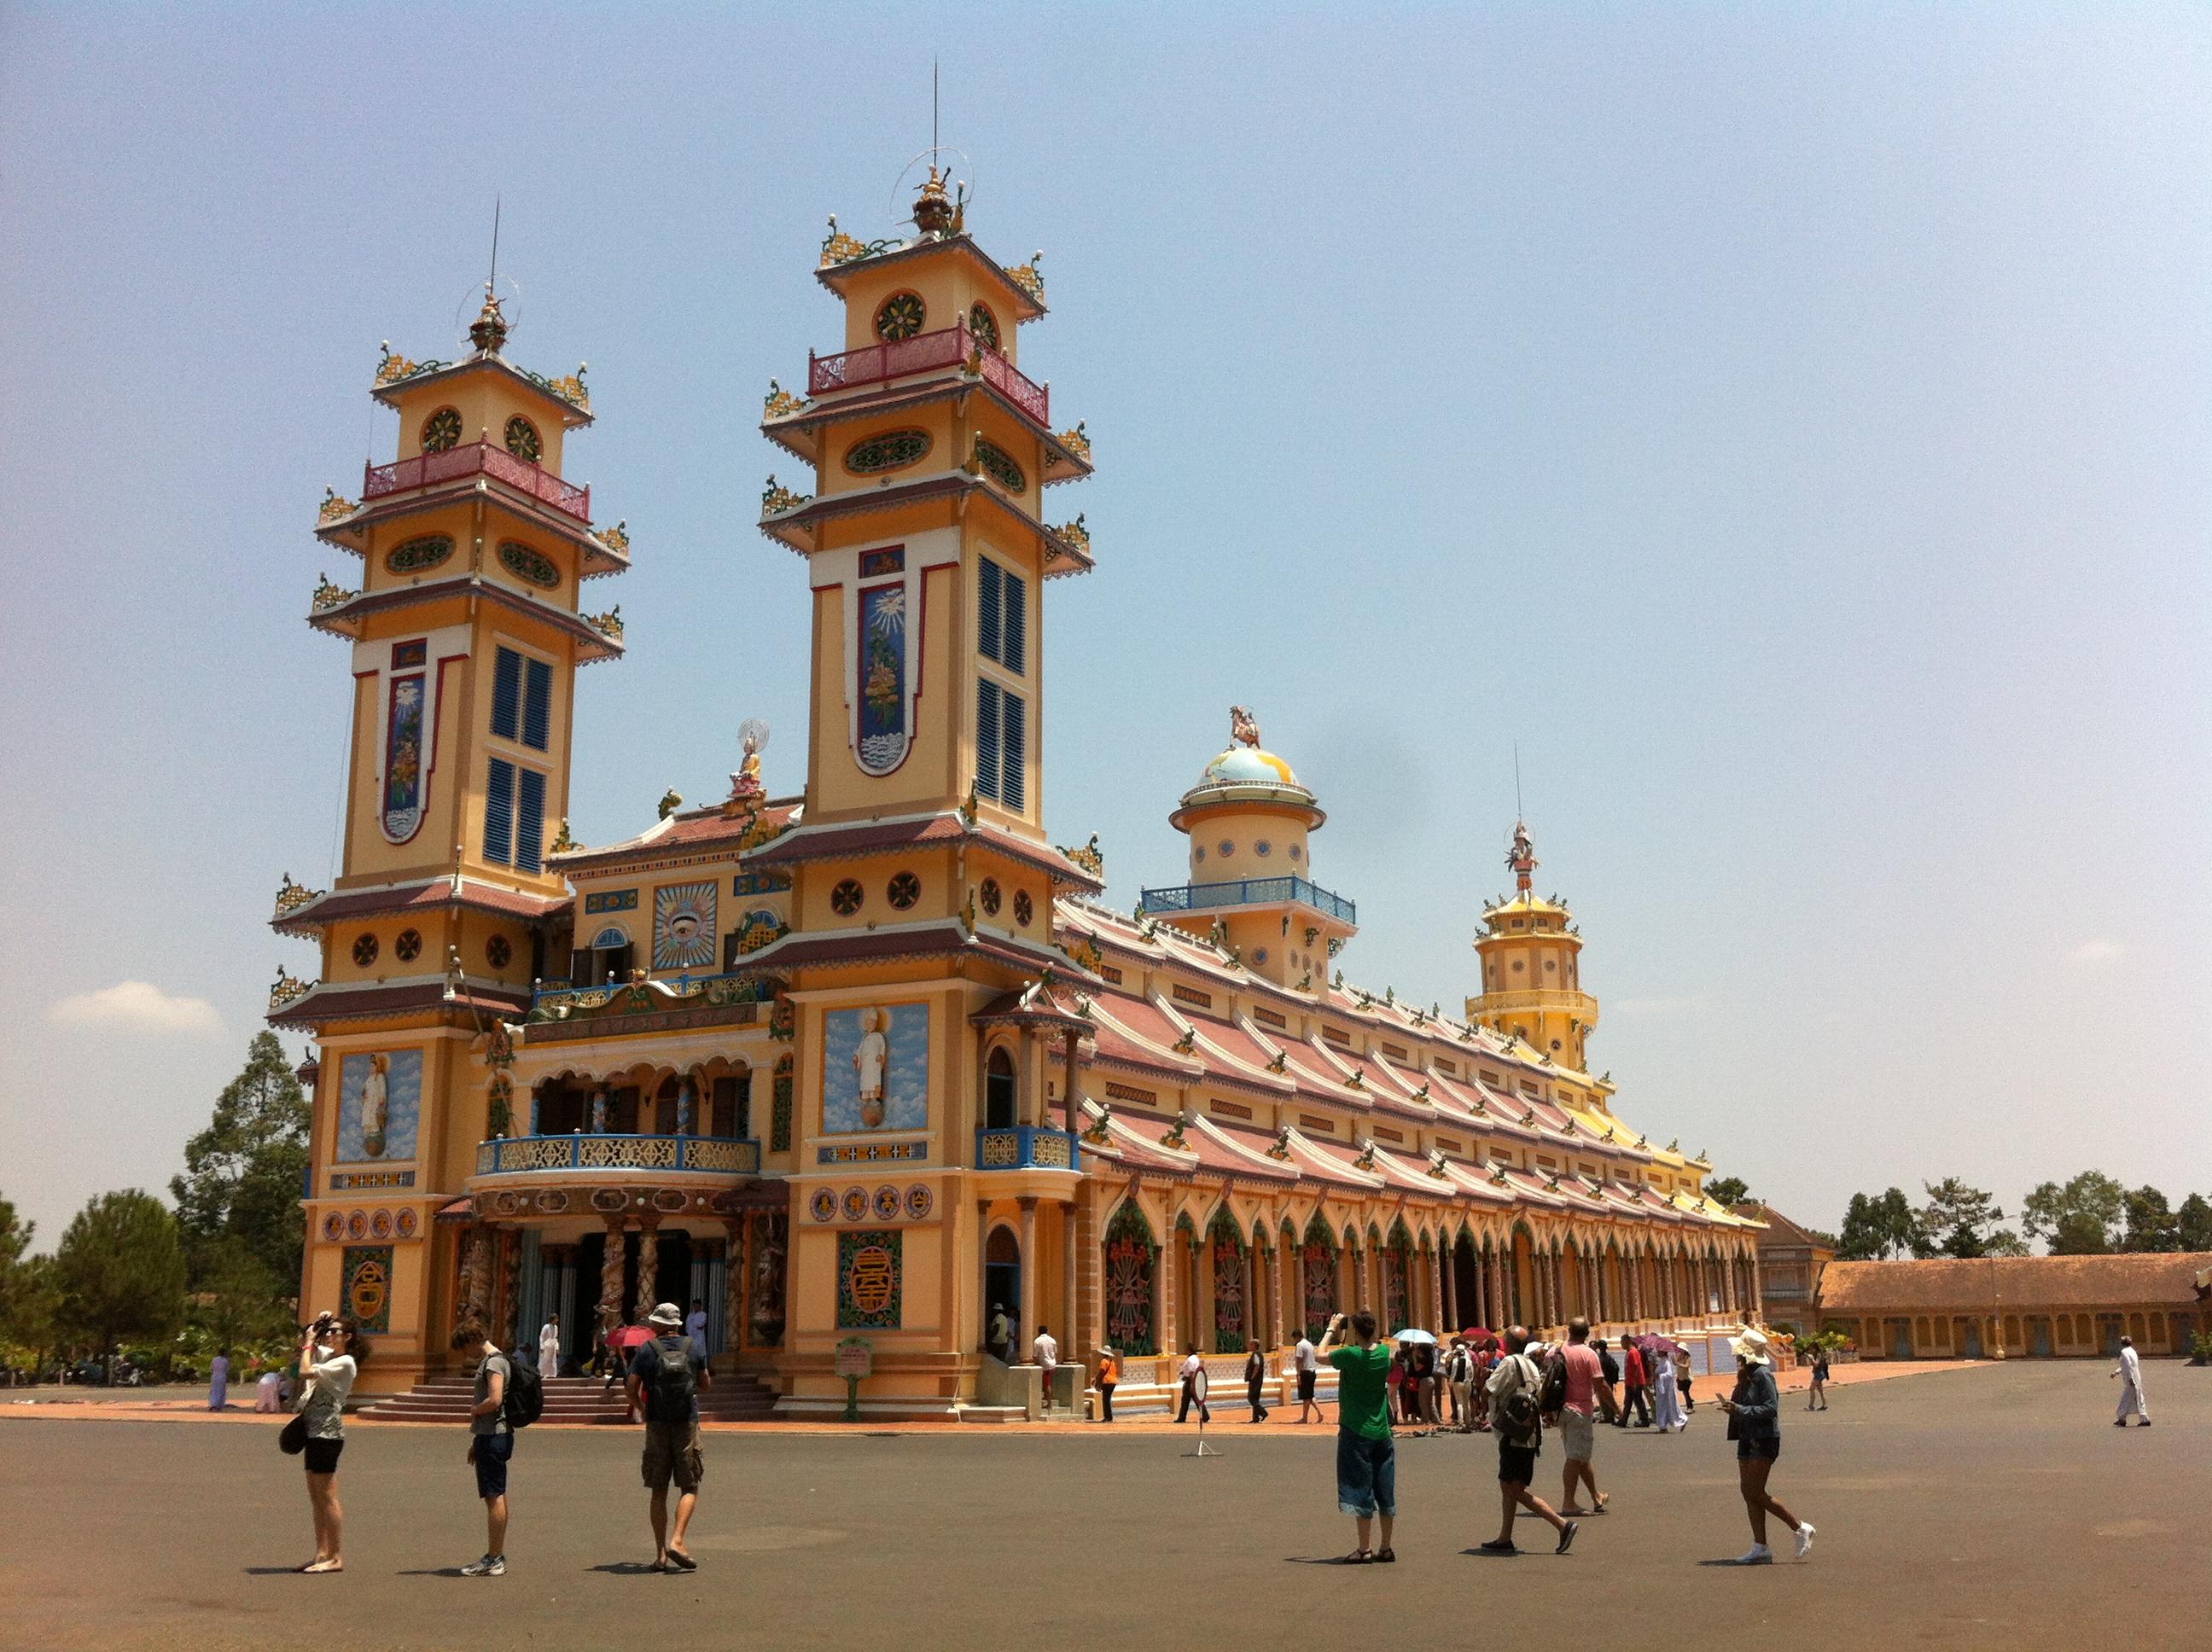 Yvonderweg - Hallo Ho Chi Minh! - Heilige Stoel van Cao Dai